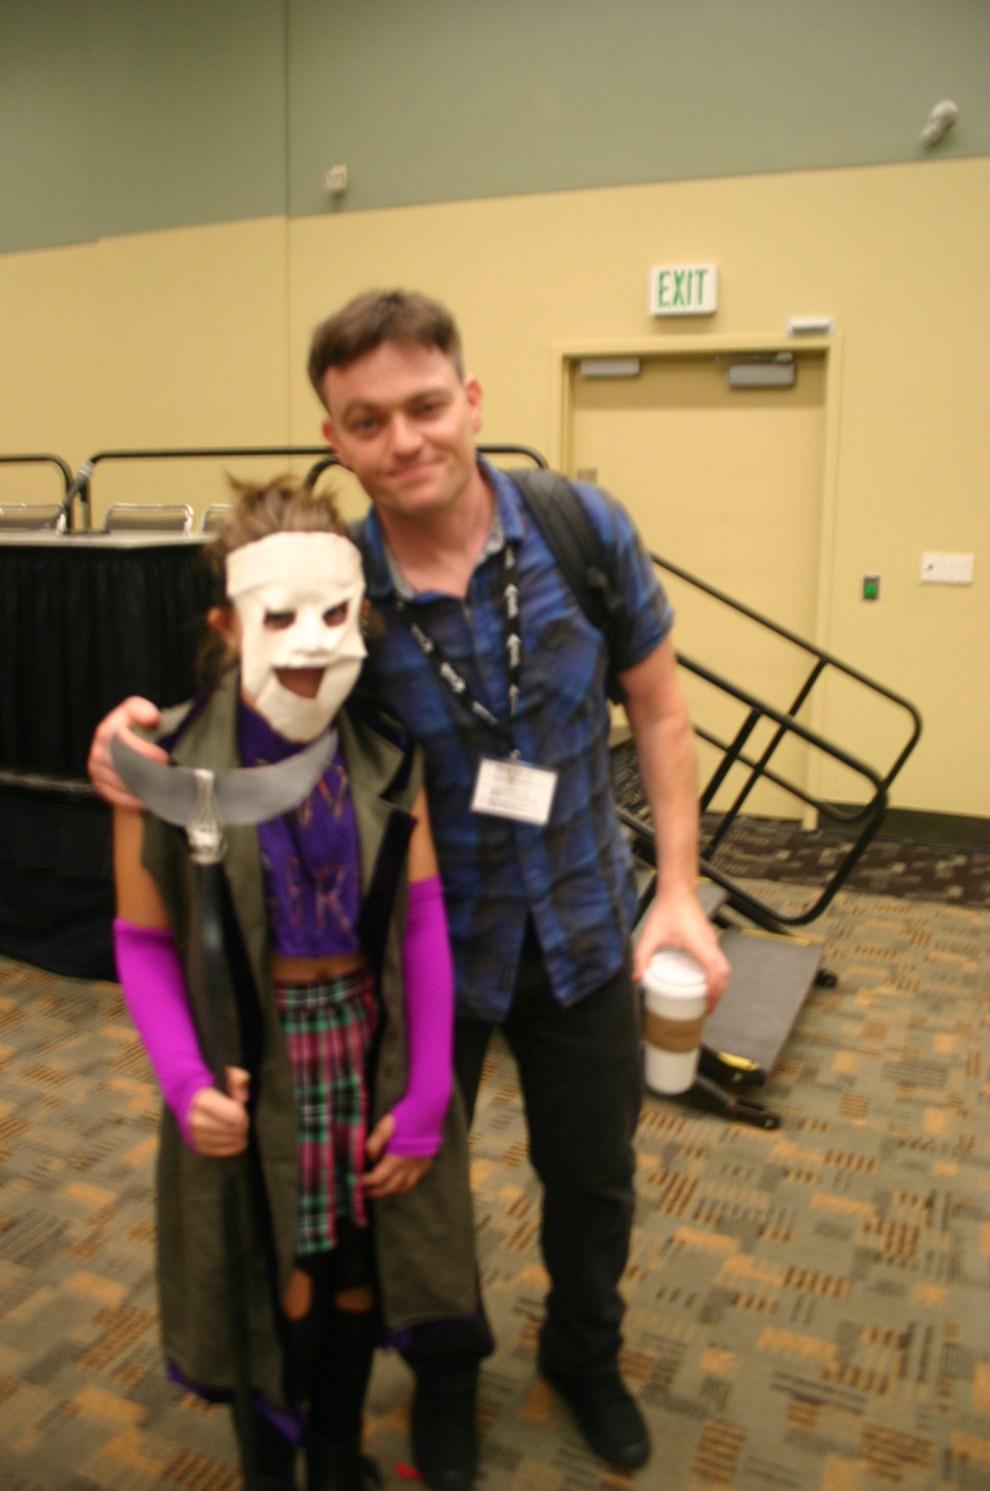 Joker's Daughter with Scott Snyder